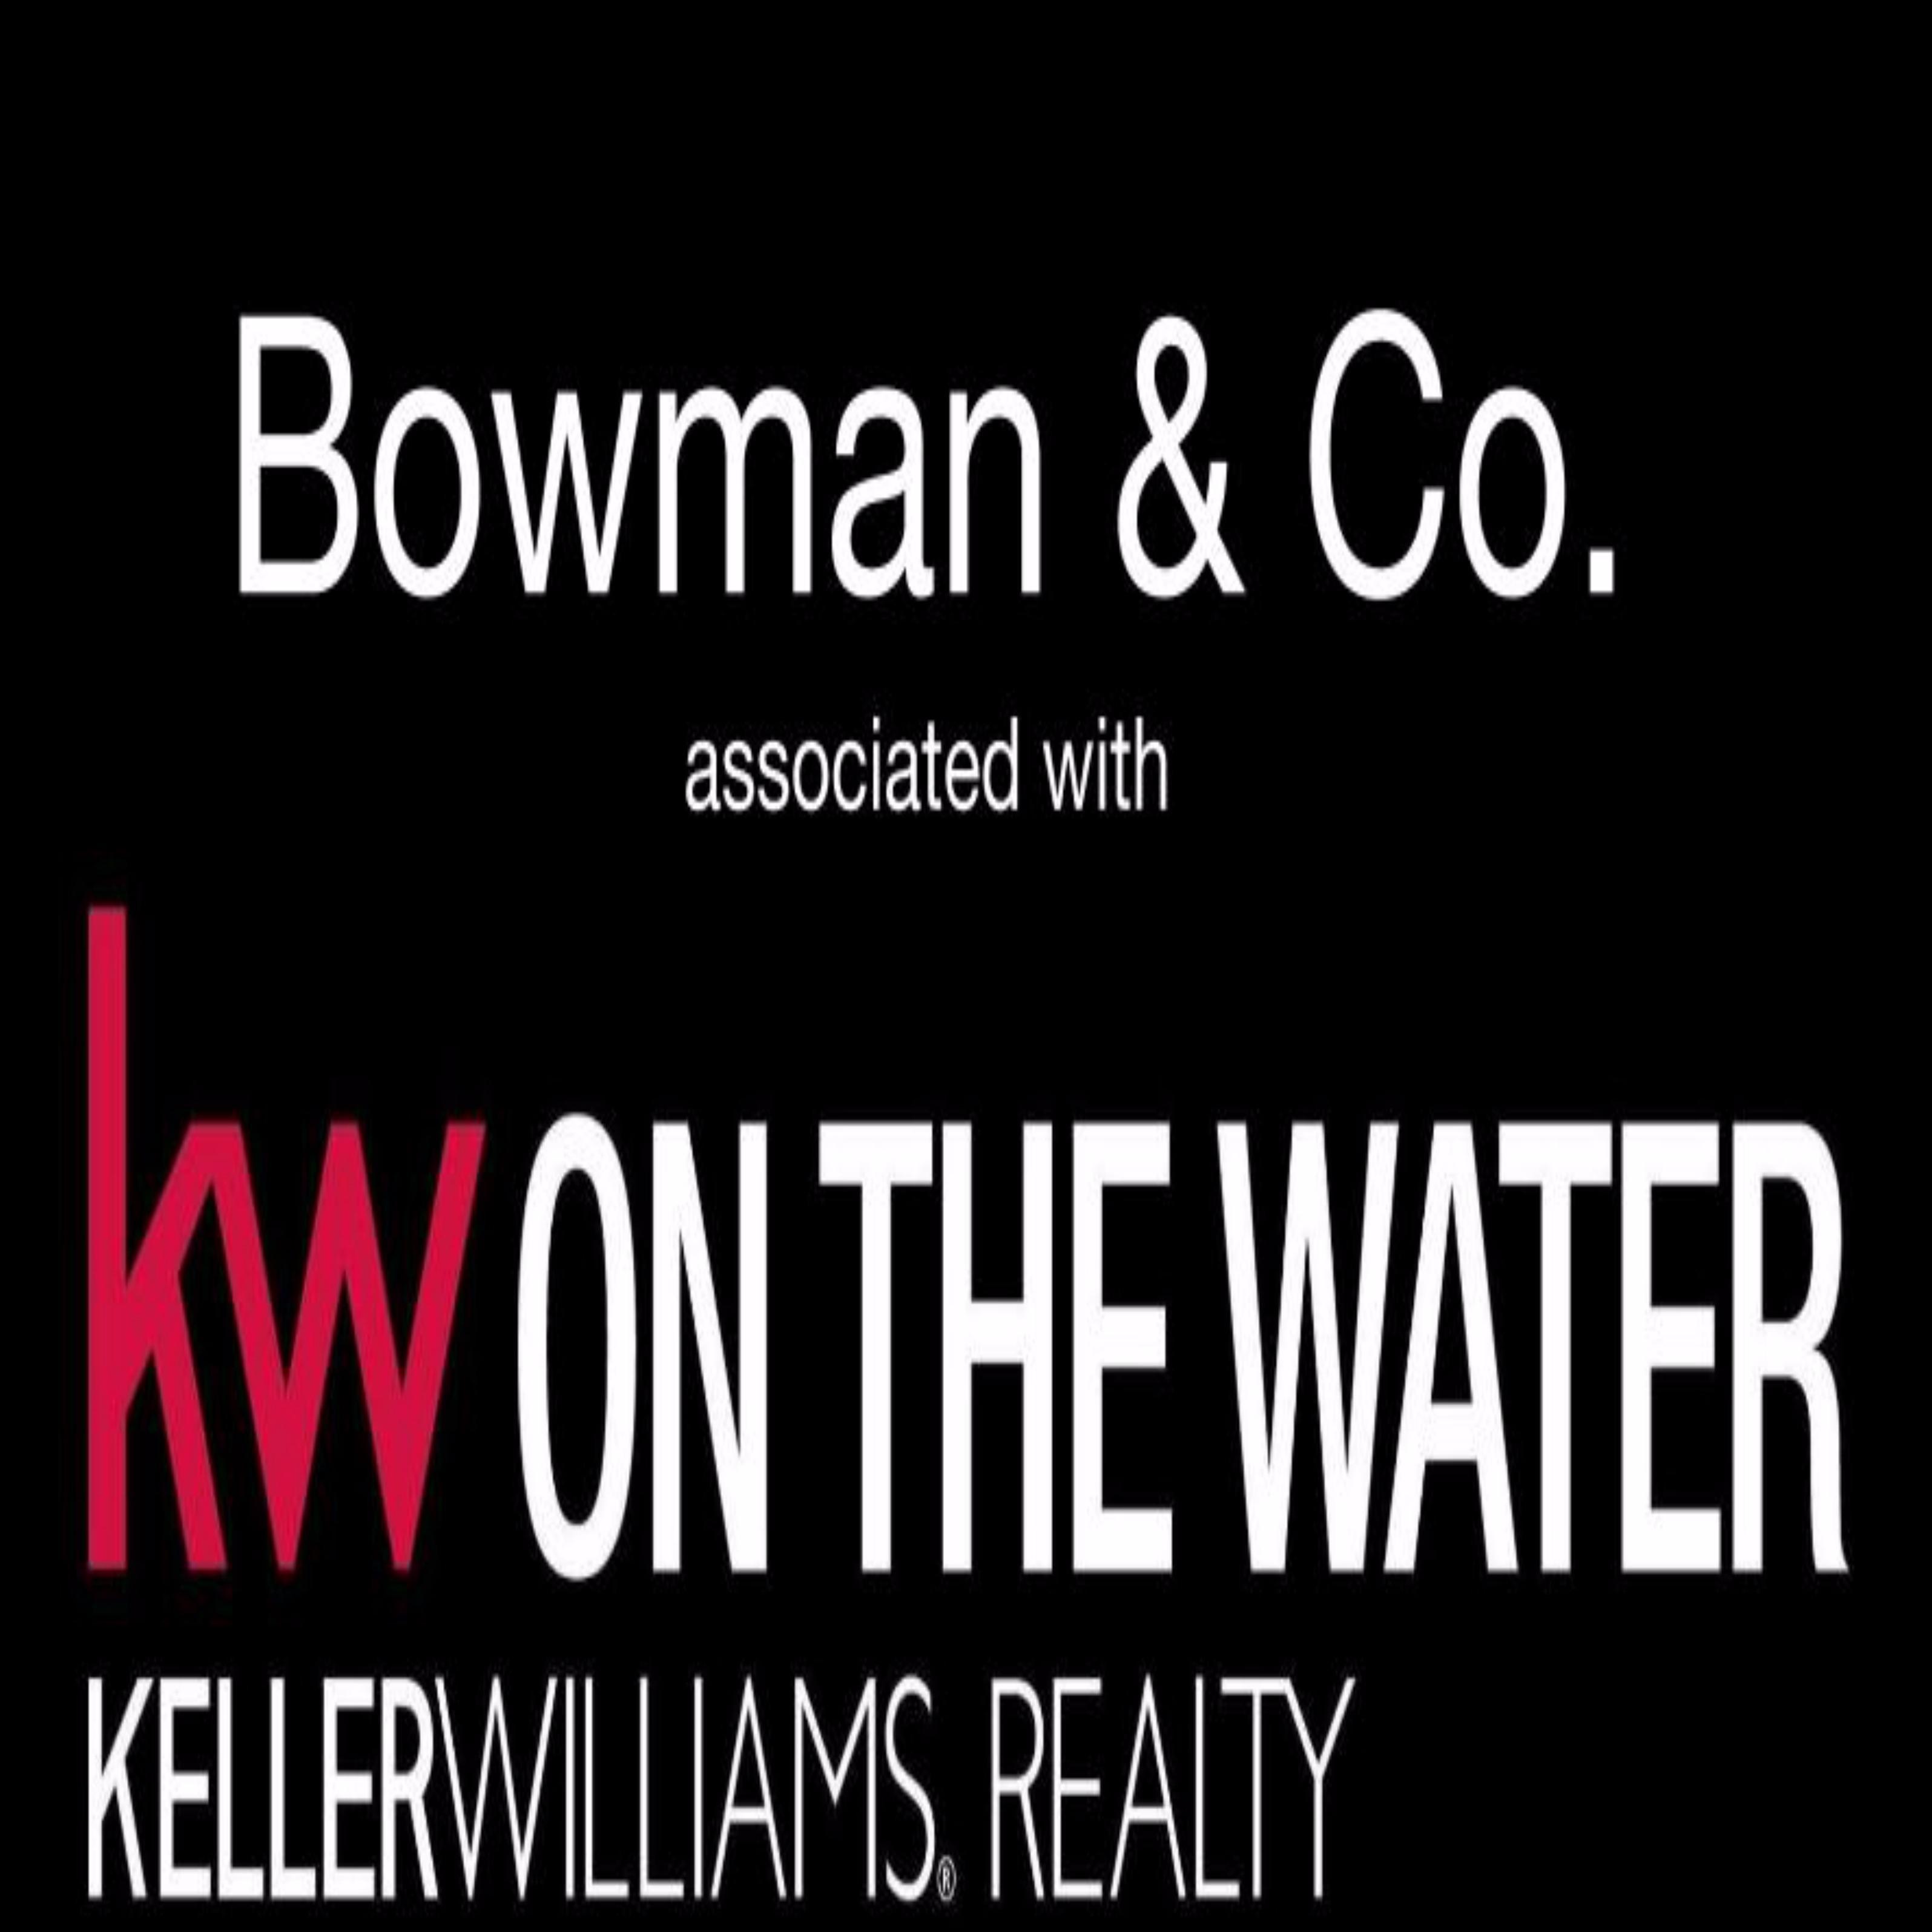 Keller Williams Realty - Bowman Group image 6